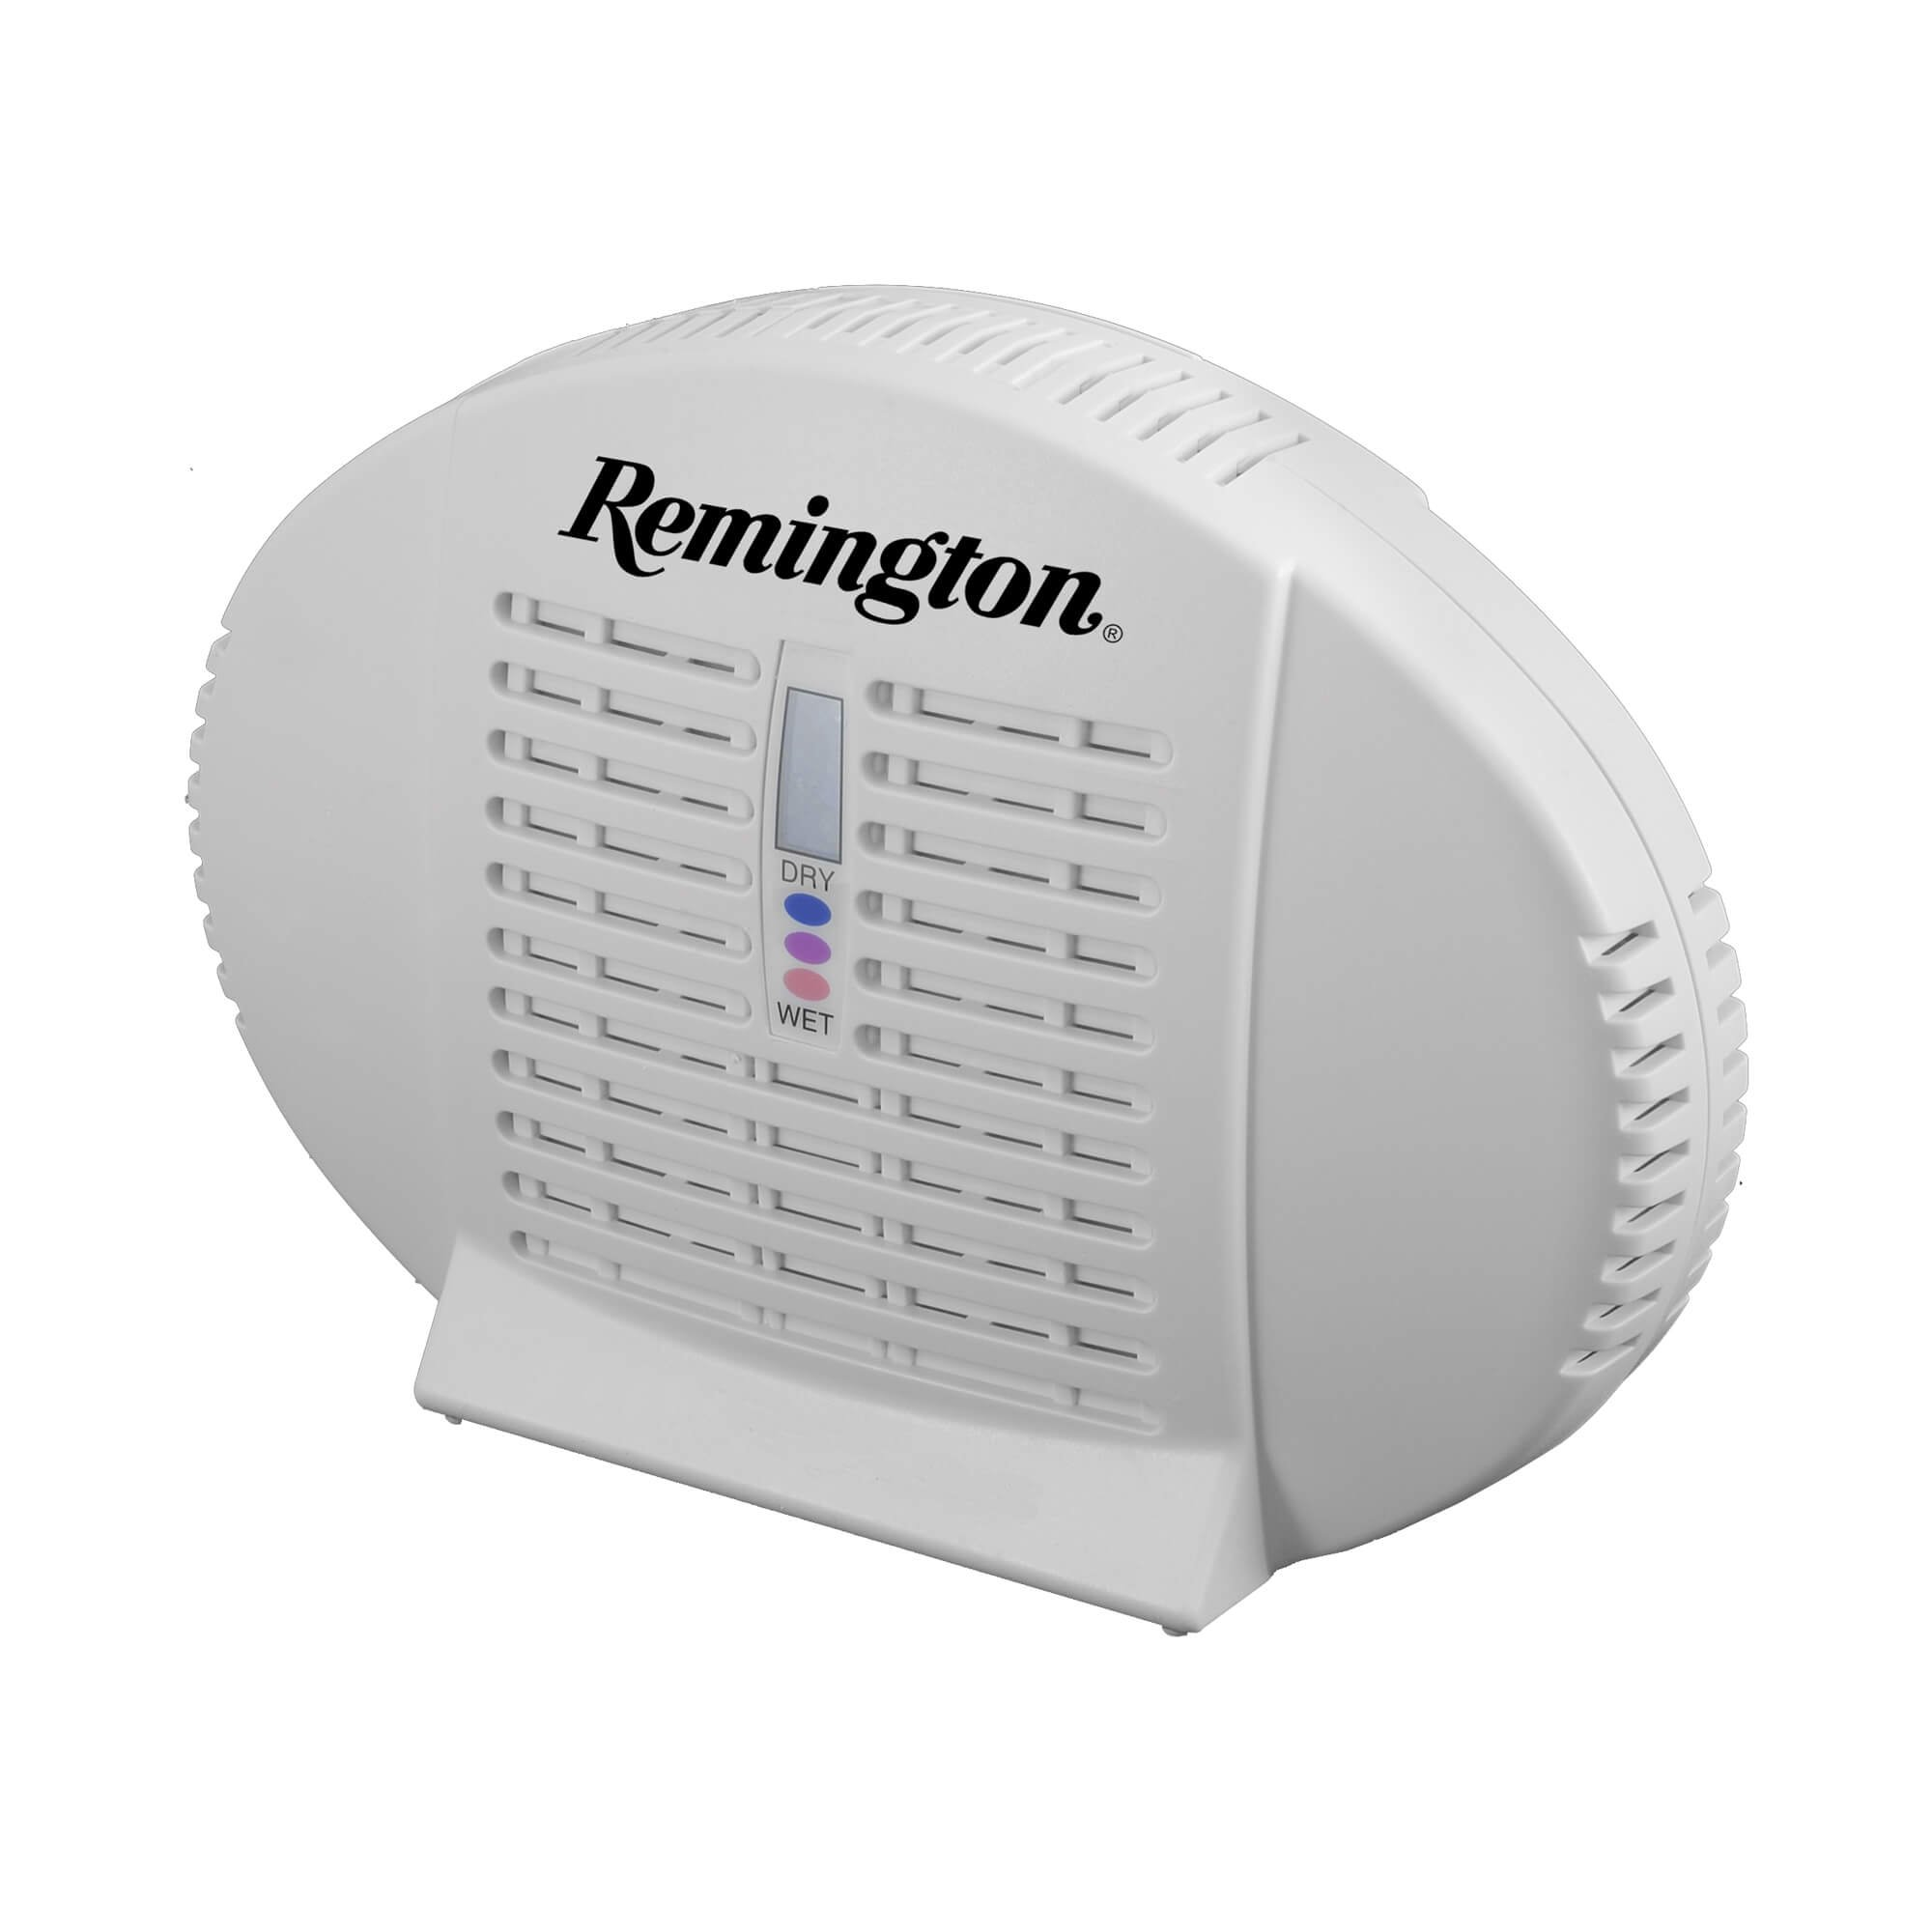 Interstate Arms Corp Remington Model 500 Mini-Dehumidifier